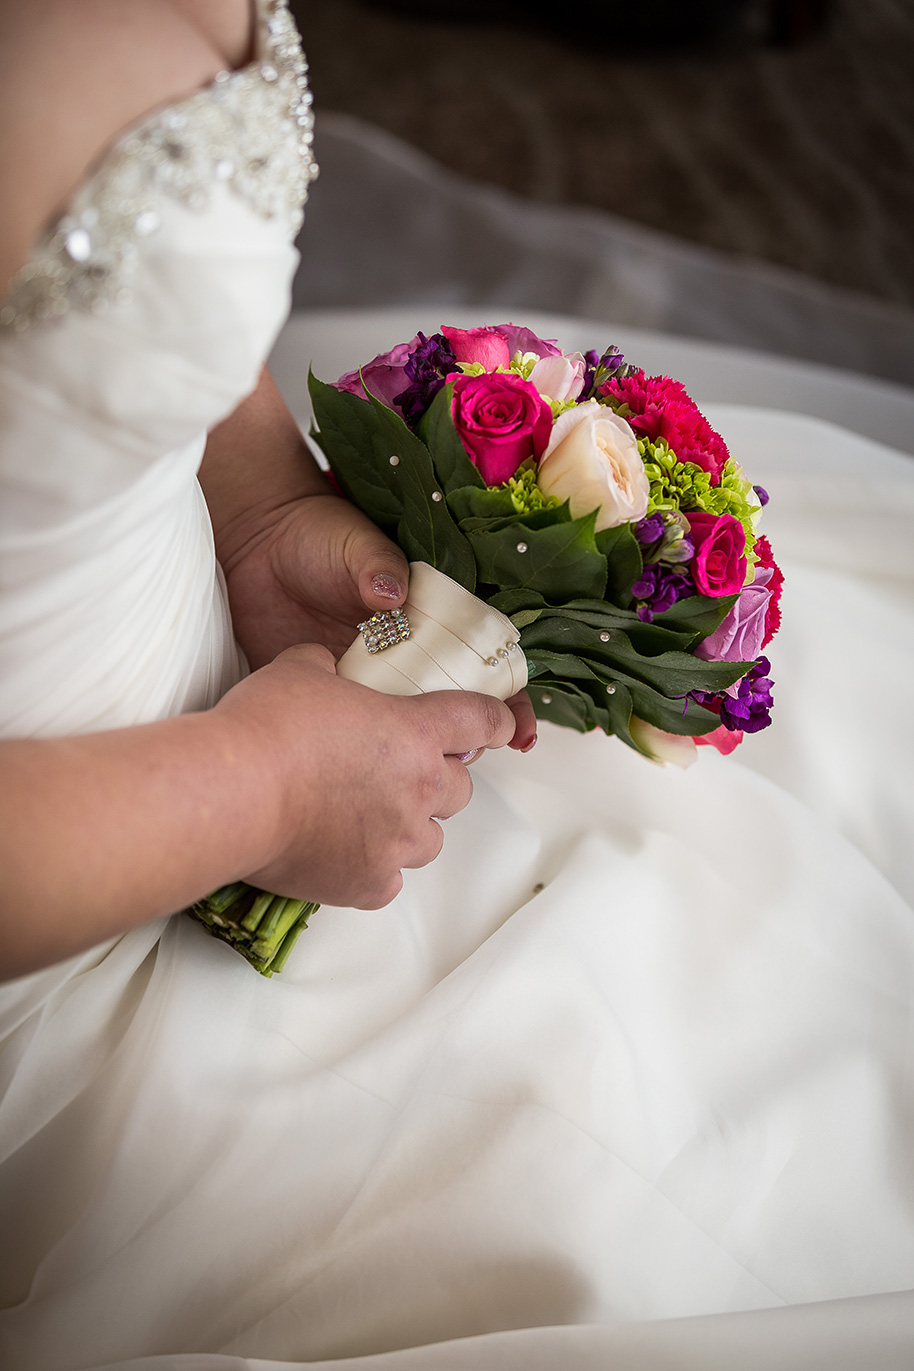 Star-Wars-Wedding-040116-12.jpg